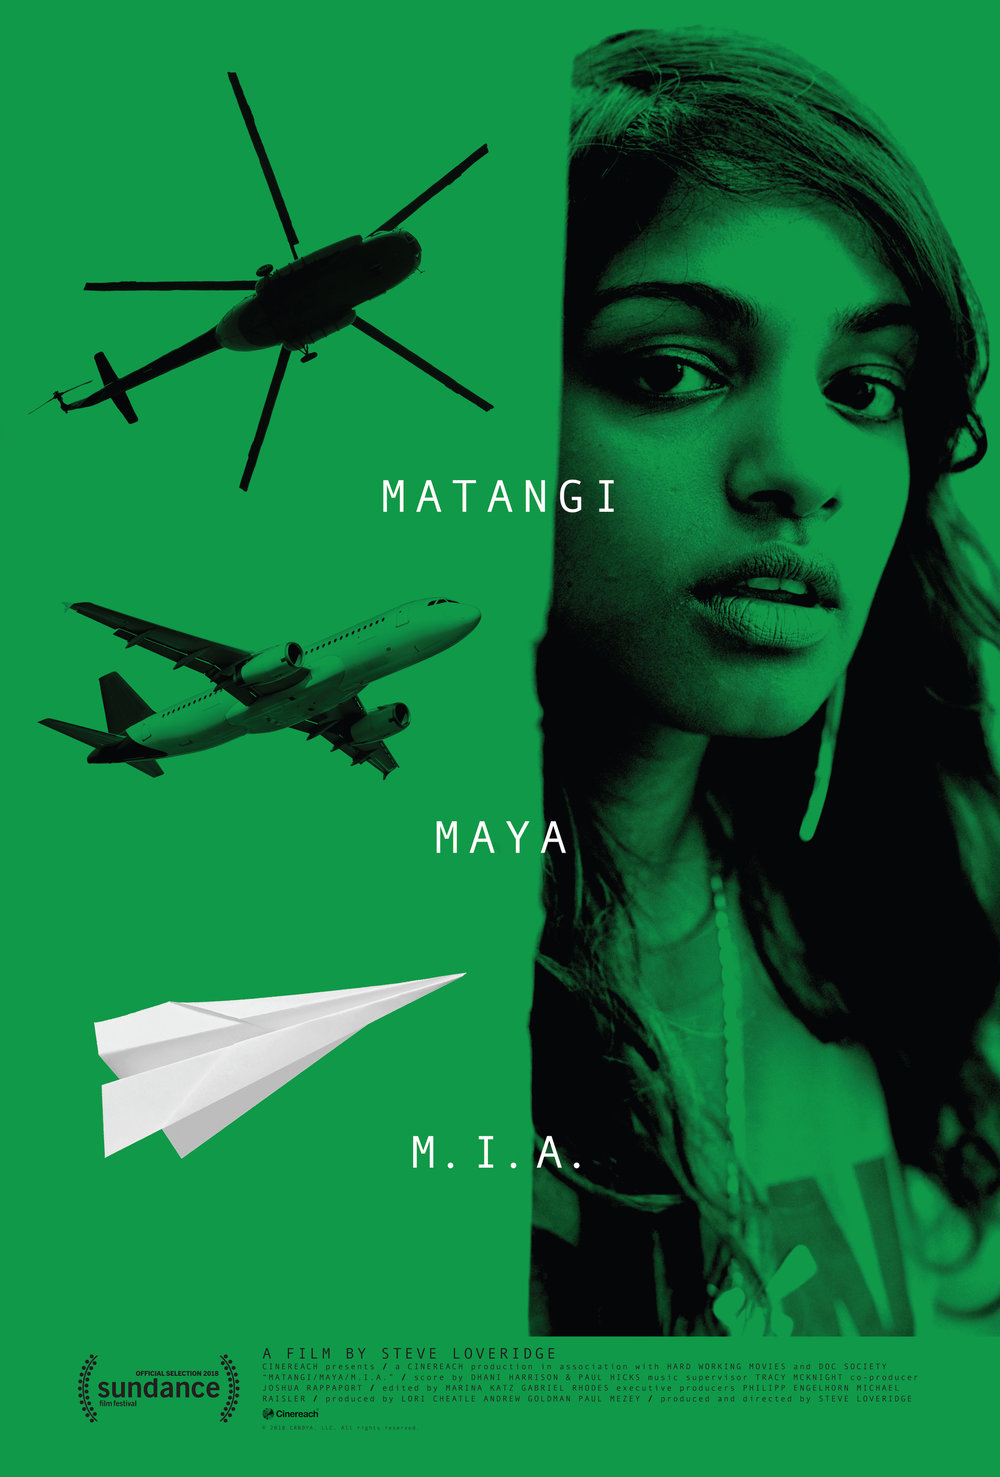 MIA_Cinereach_Posters_FINAL_ENGLISH_WEB_small.jpg